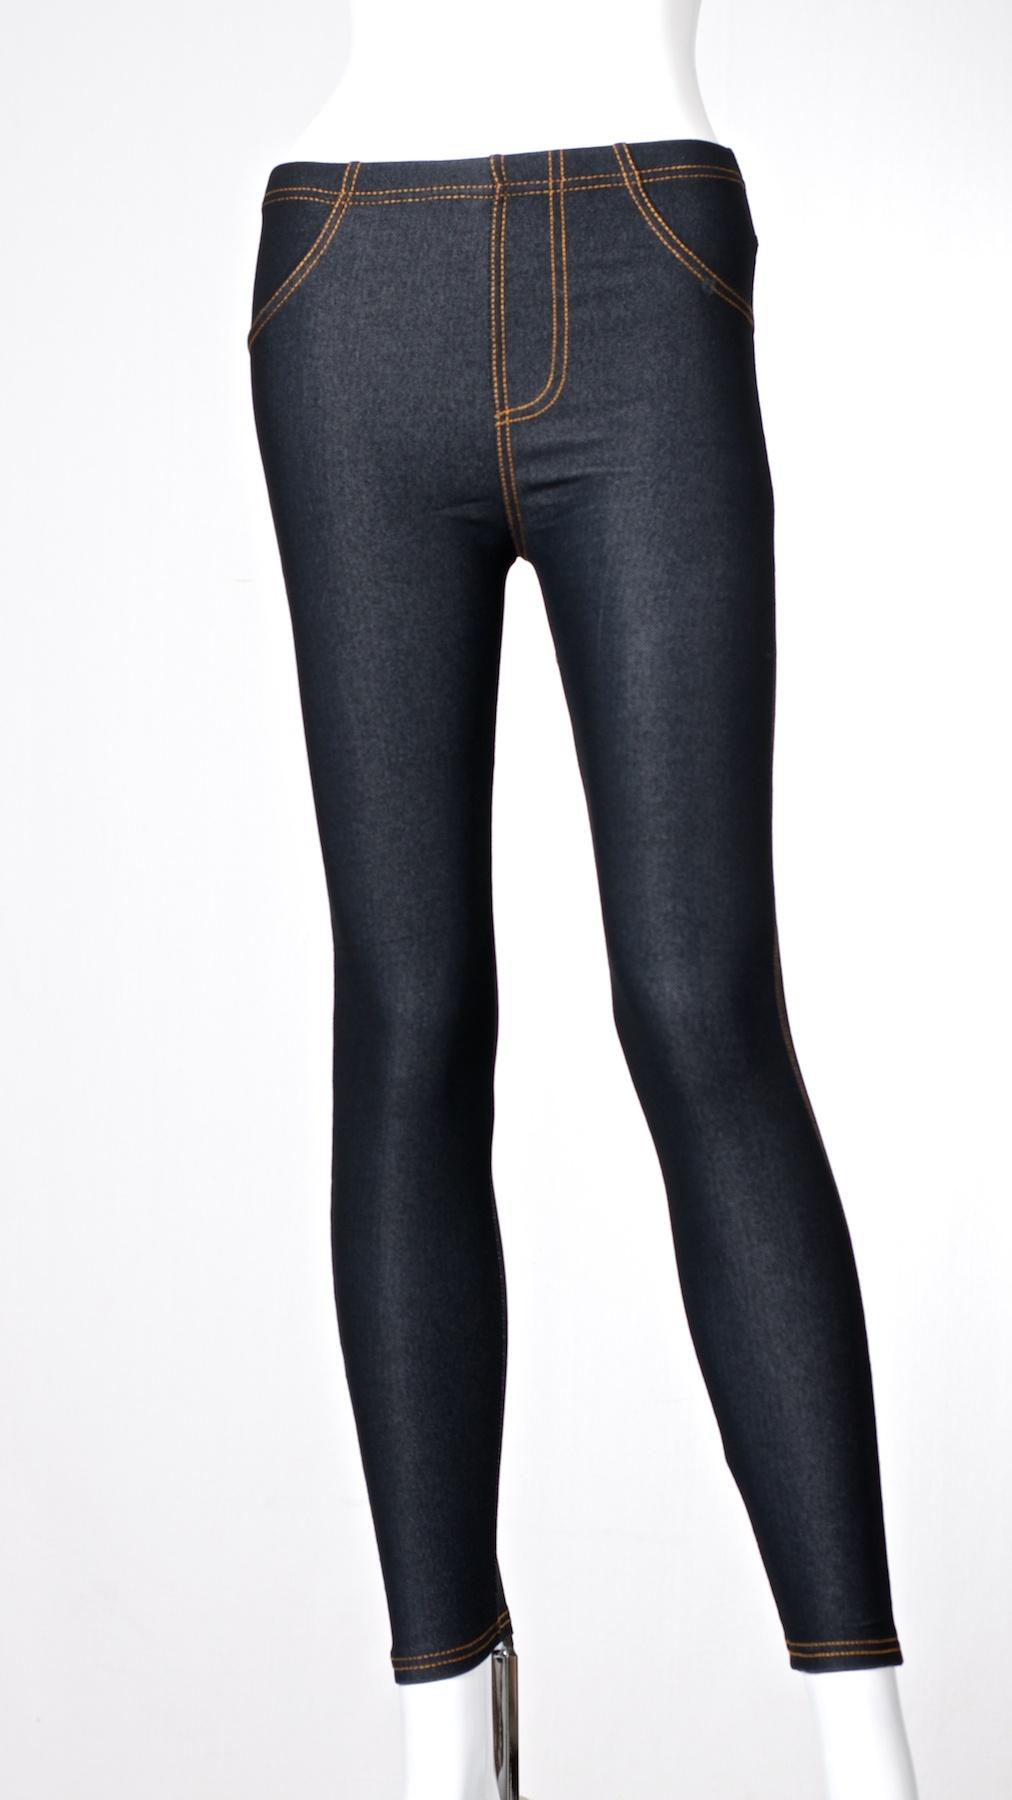 jeans optik damen leggings hose leggins treggings m l xl xxl xxxl 4xl 5xl lang ebay. Black Bedroom Furniture Sets. Home Design Ideas